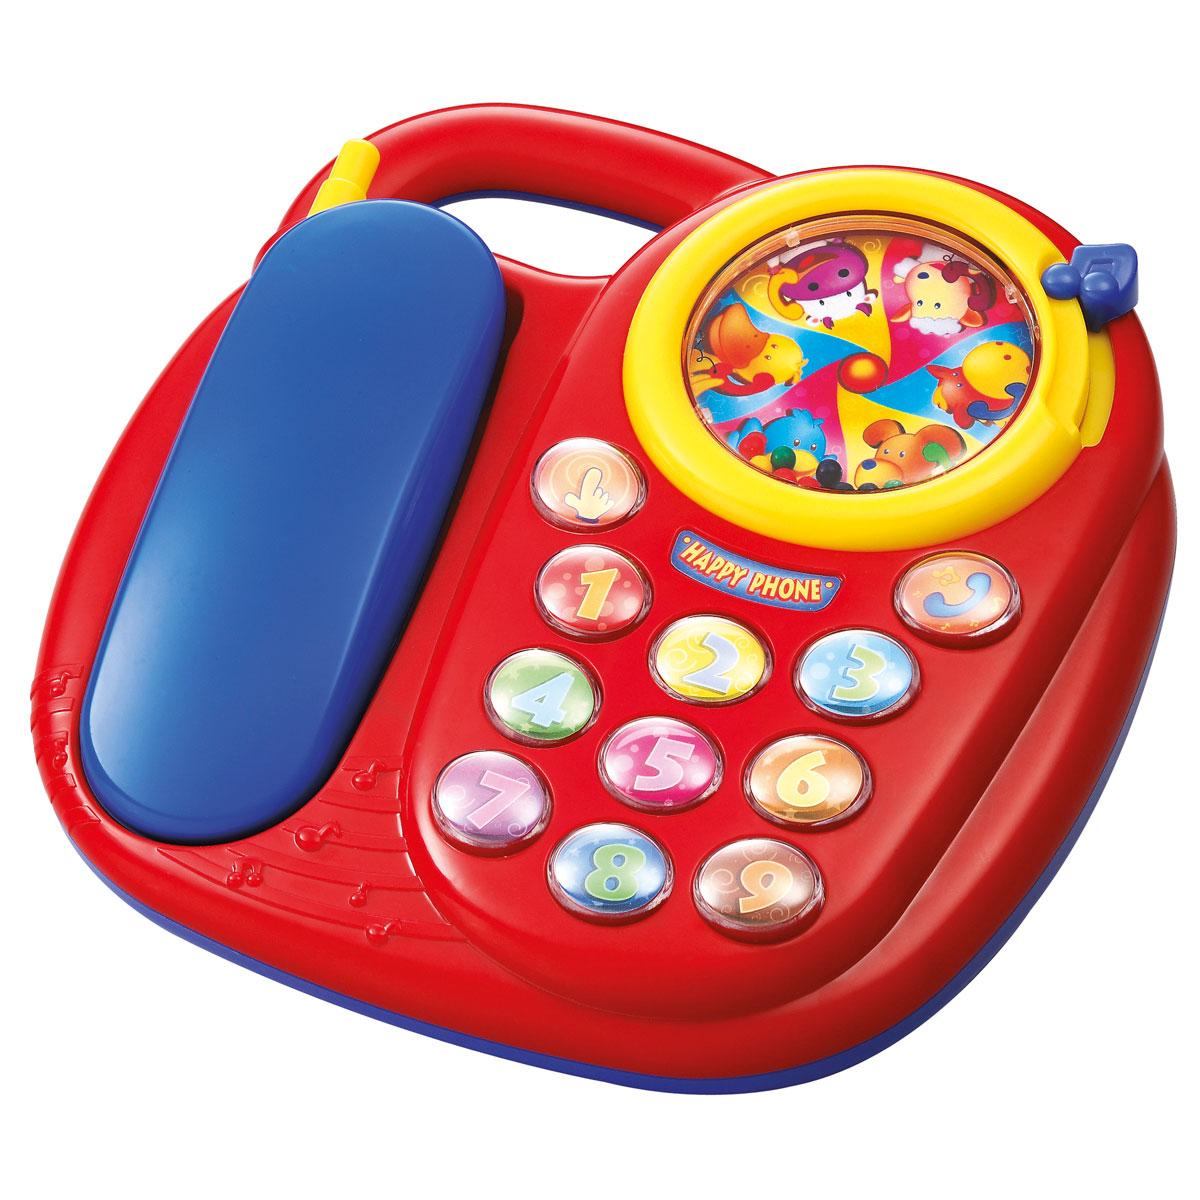 Image of   Baby Buddy telefon med lyde